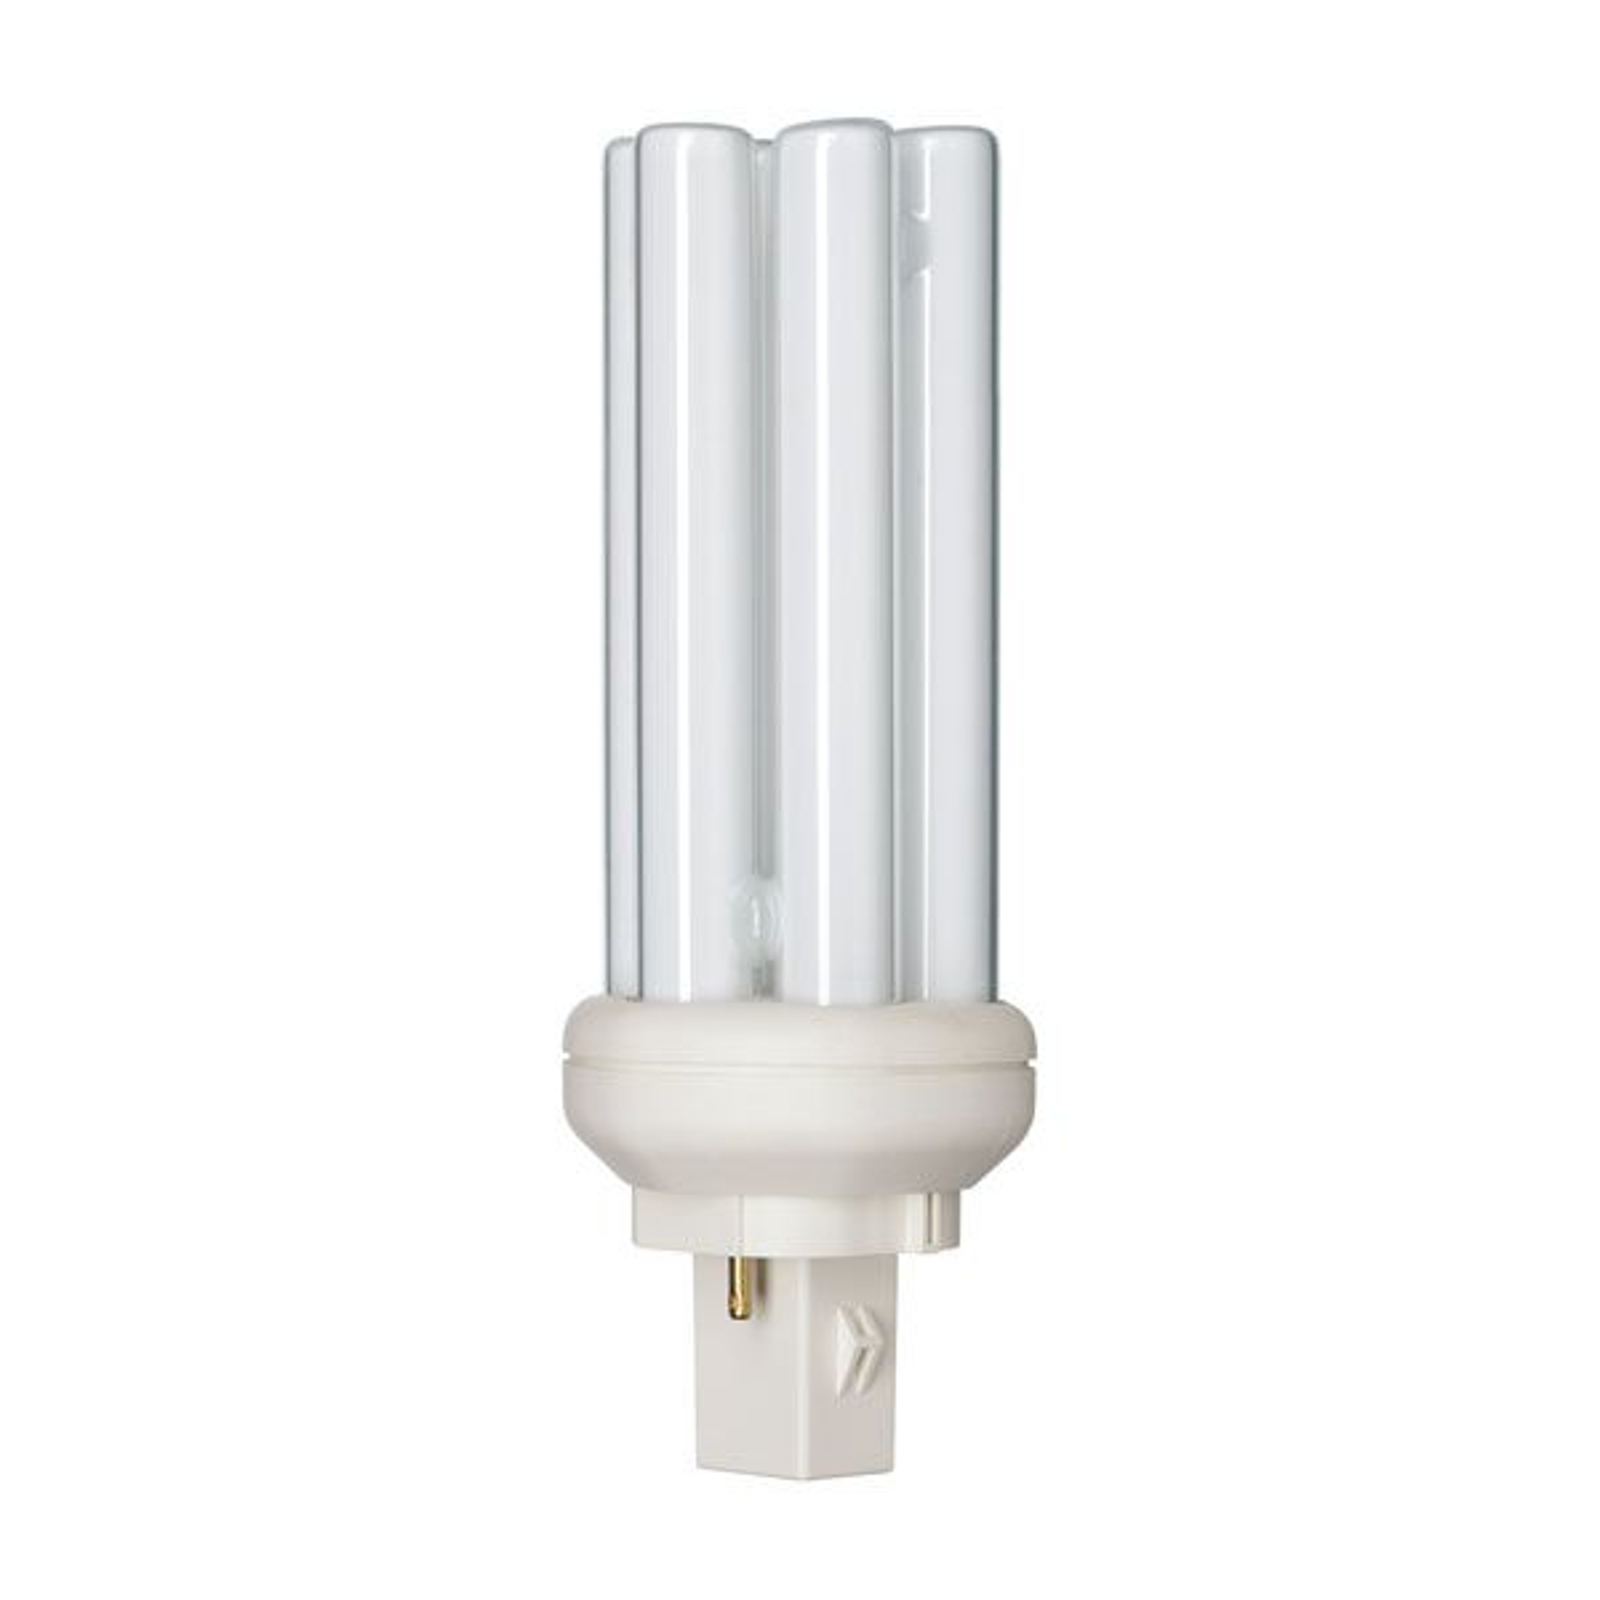 GX24d Kompaktleuchtstofflampe Master 26W PL-T 830